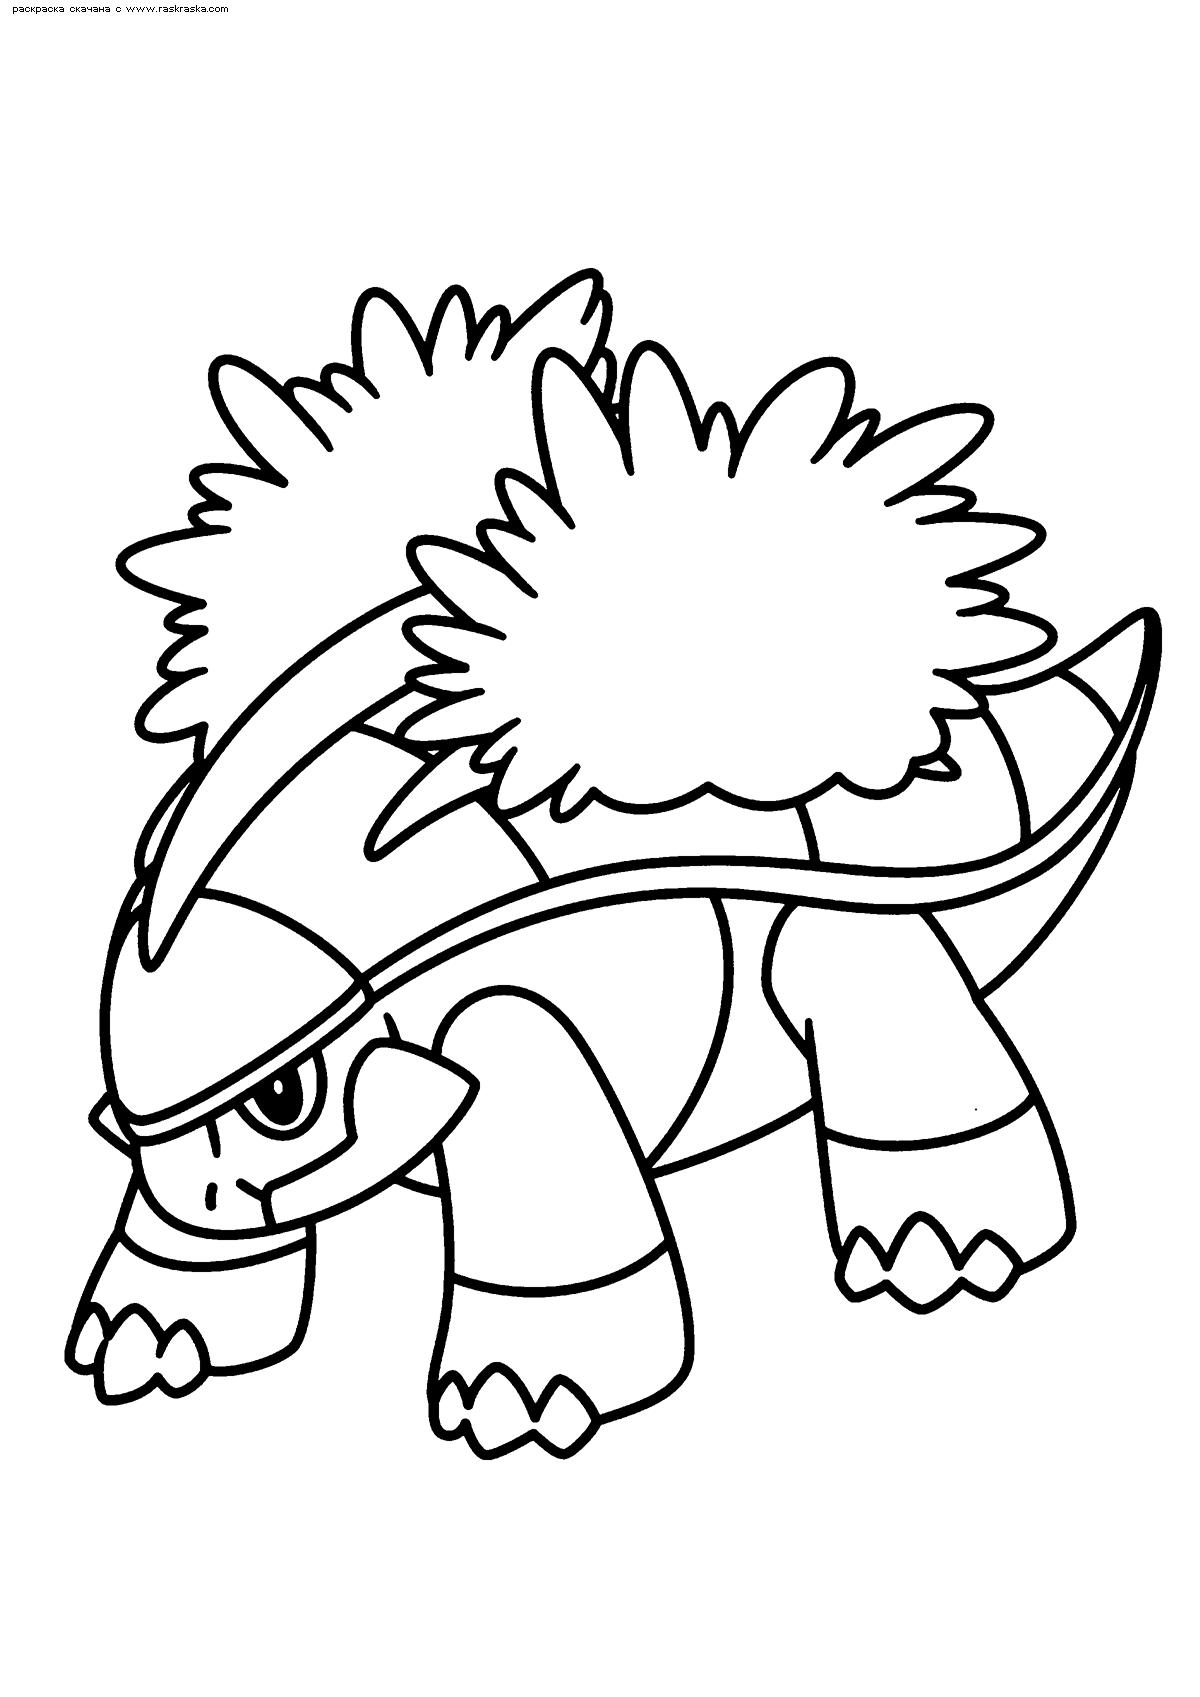 Раскраска Покемон Гротл (Grotle) | Раскраски эволюция ...